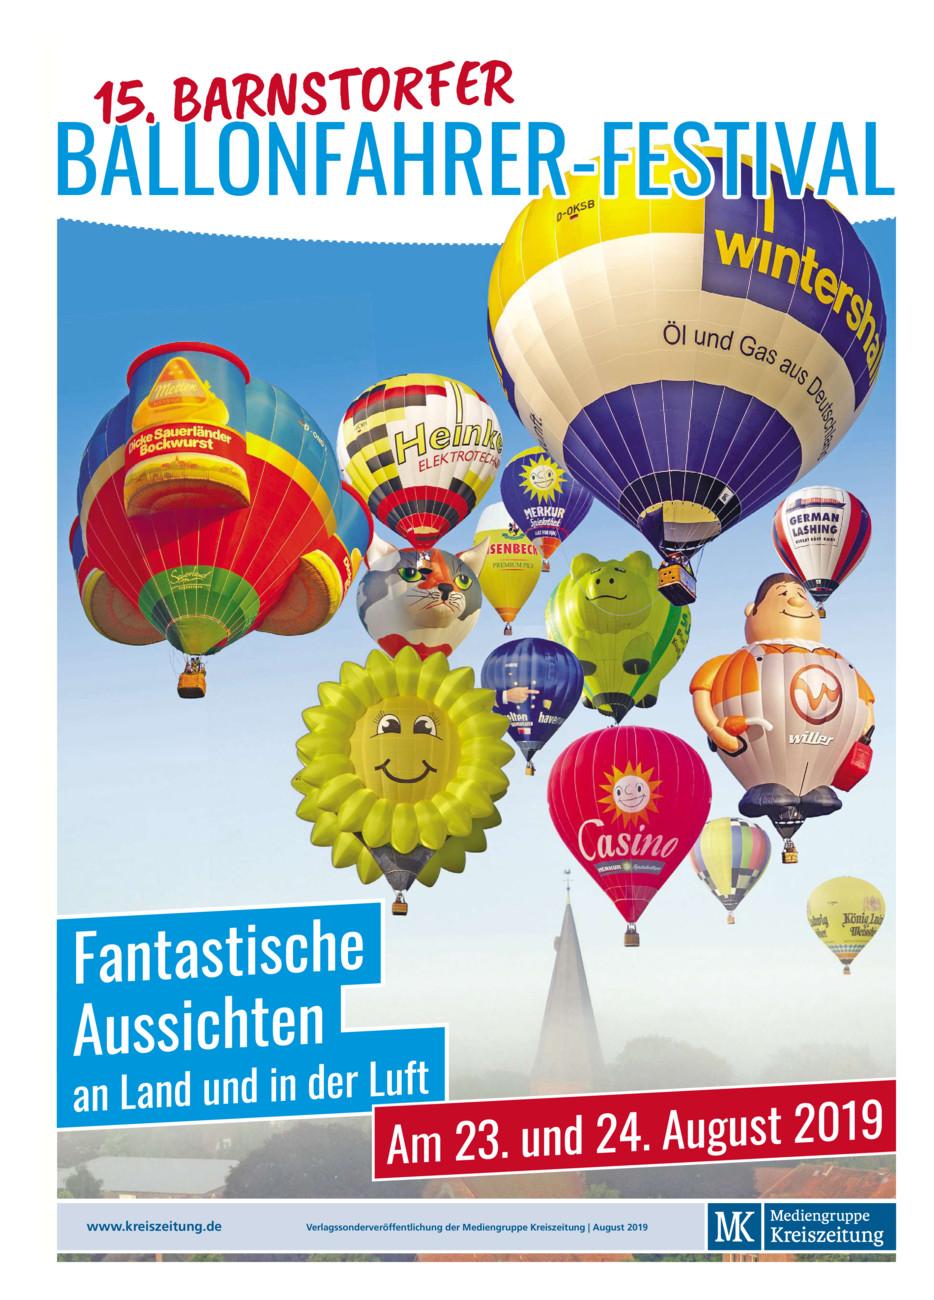 Barnstorfer Ballonfahrer-Festival vom Samstag, 17.08.2019